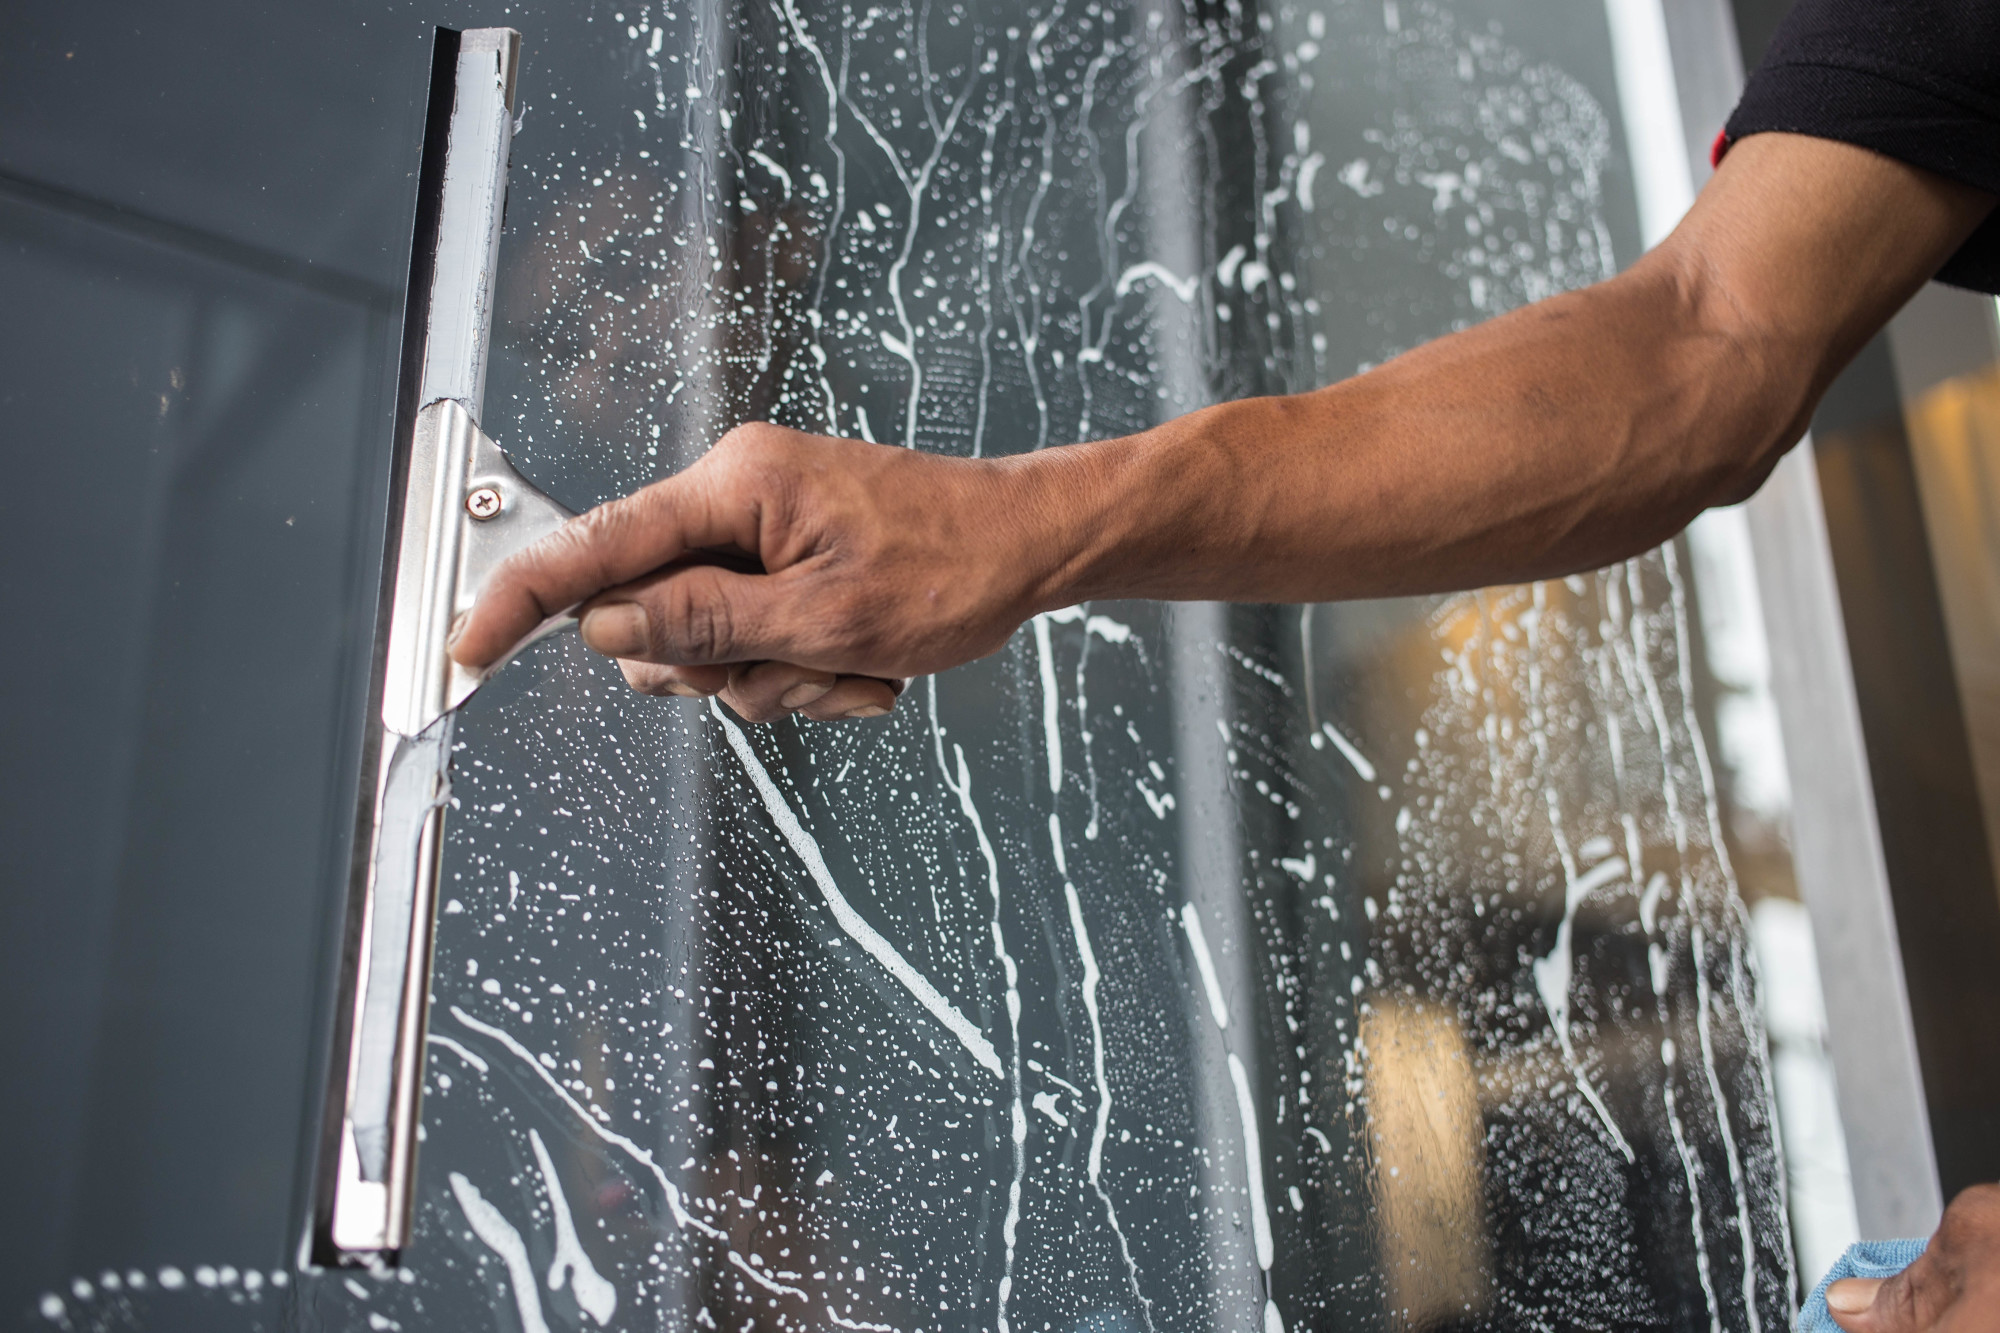 How to Get Streak-Free Windows